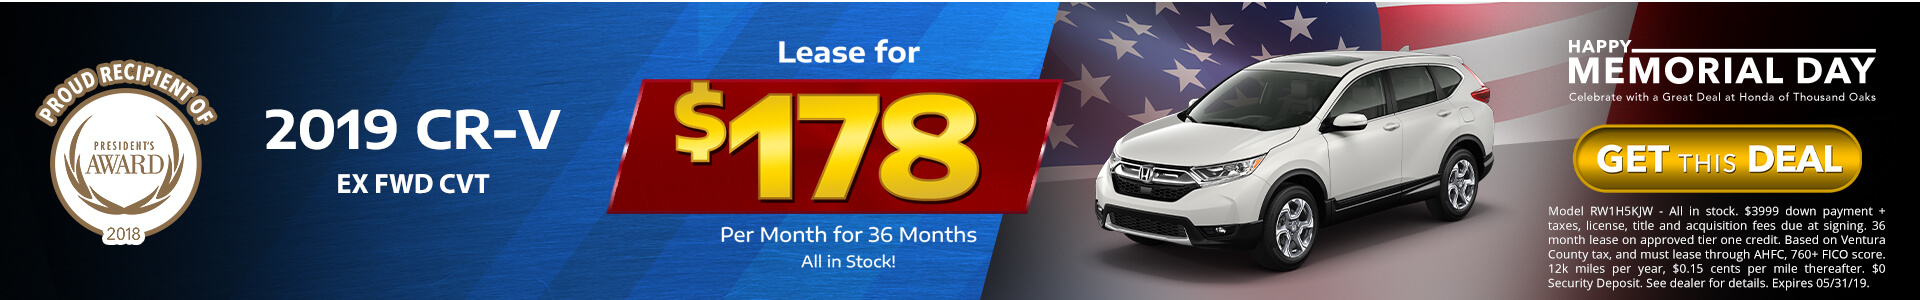 Honda CRV $178 Lease